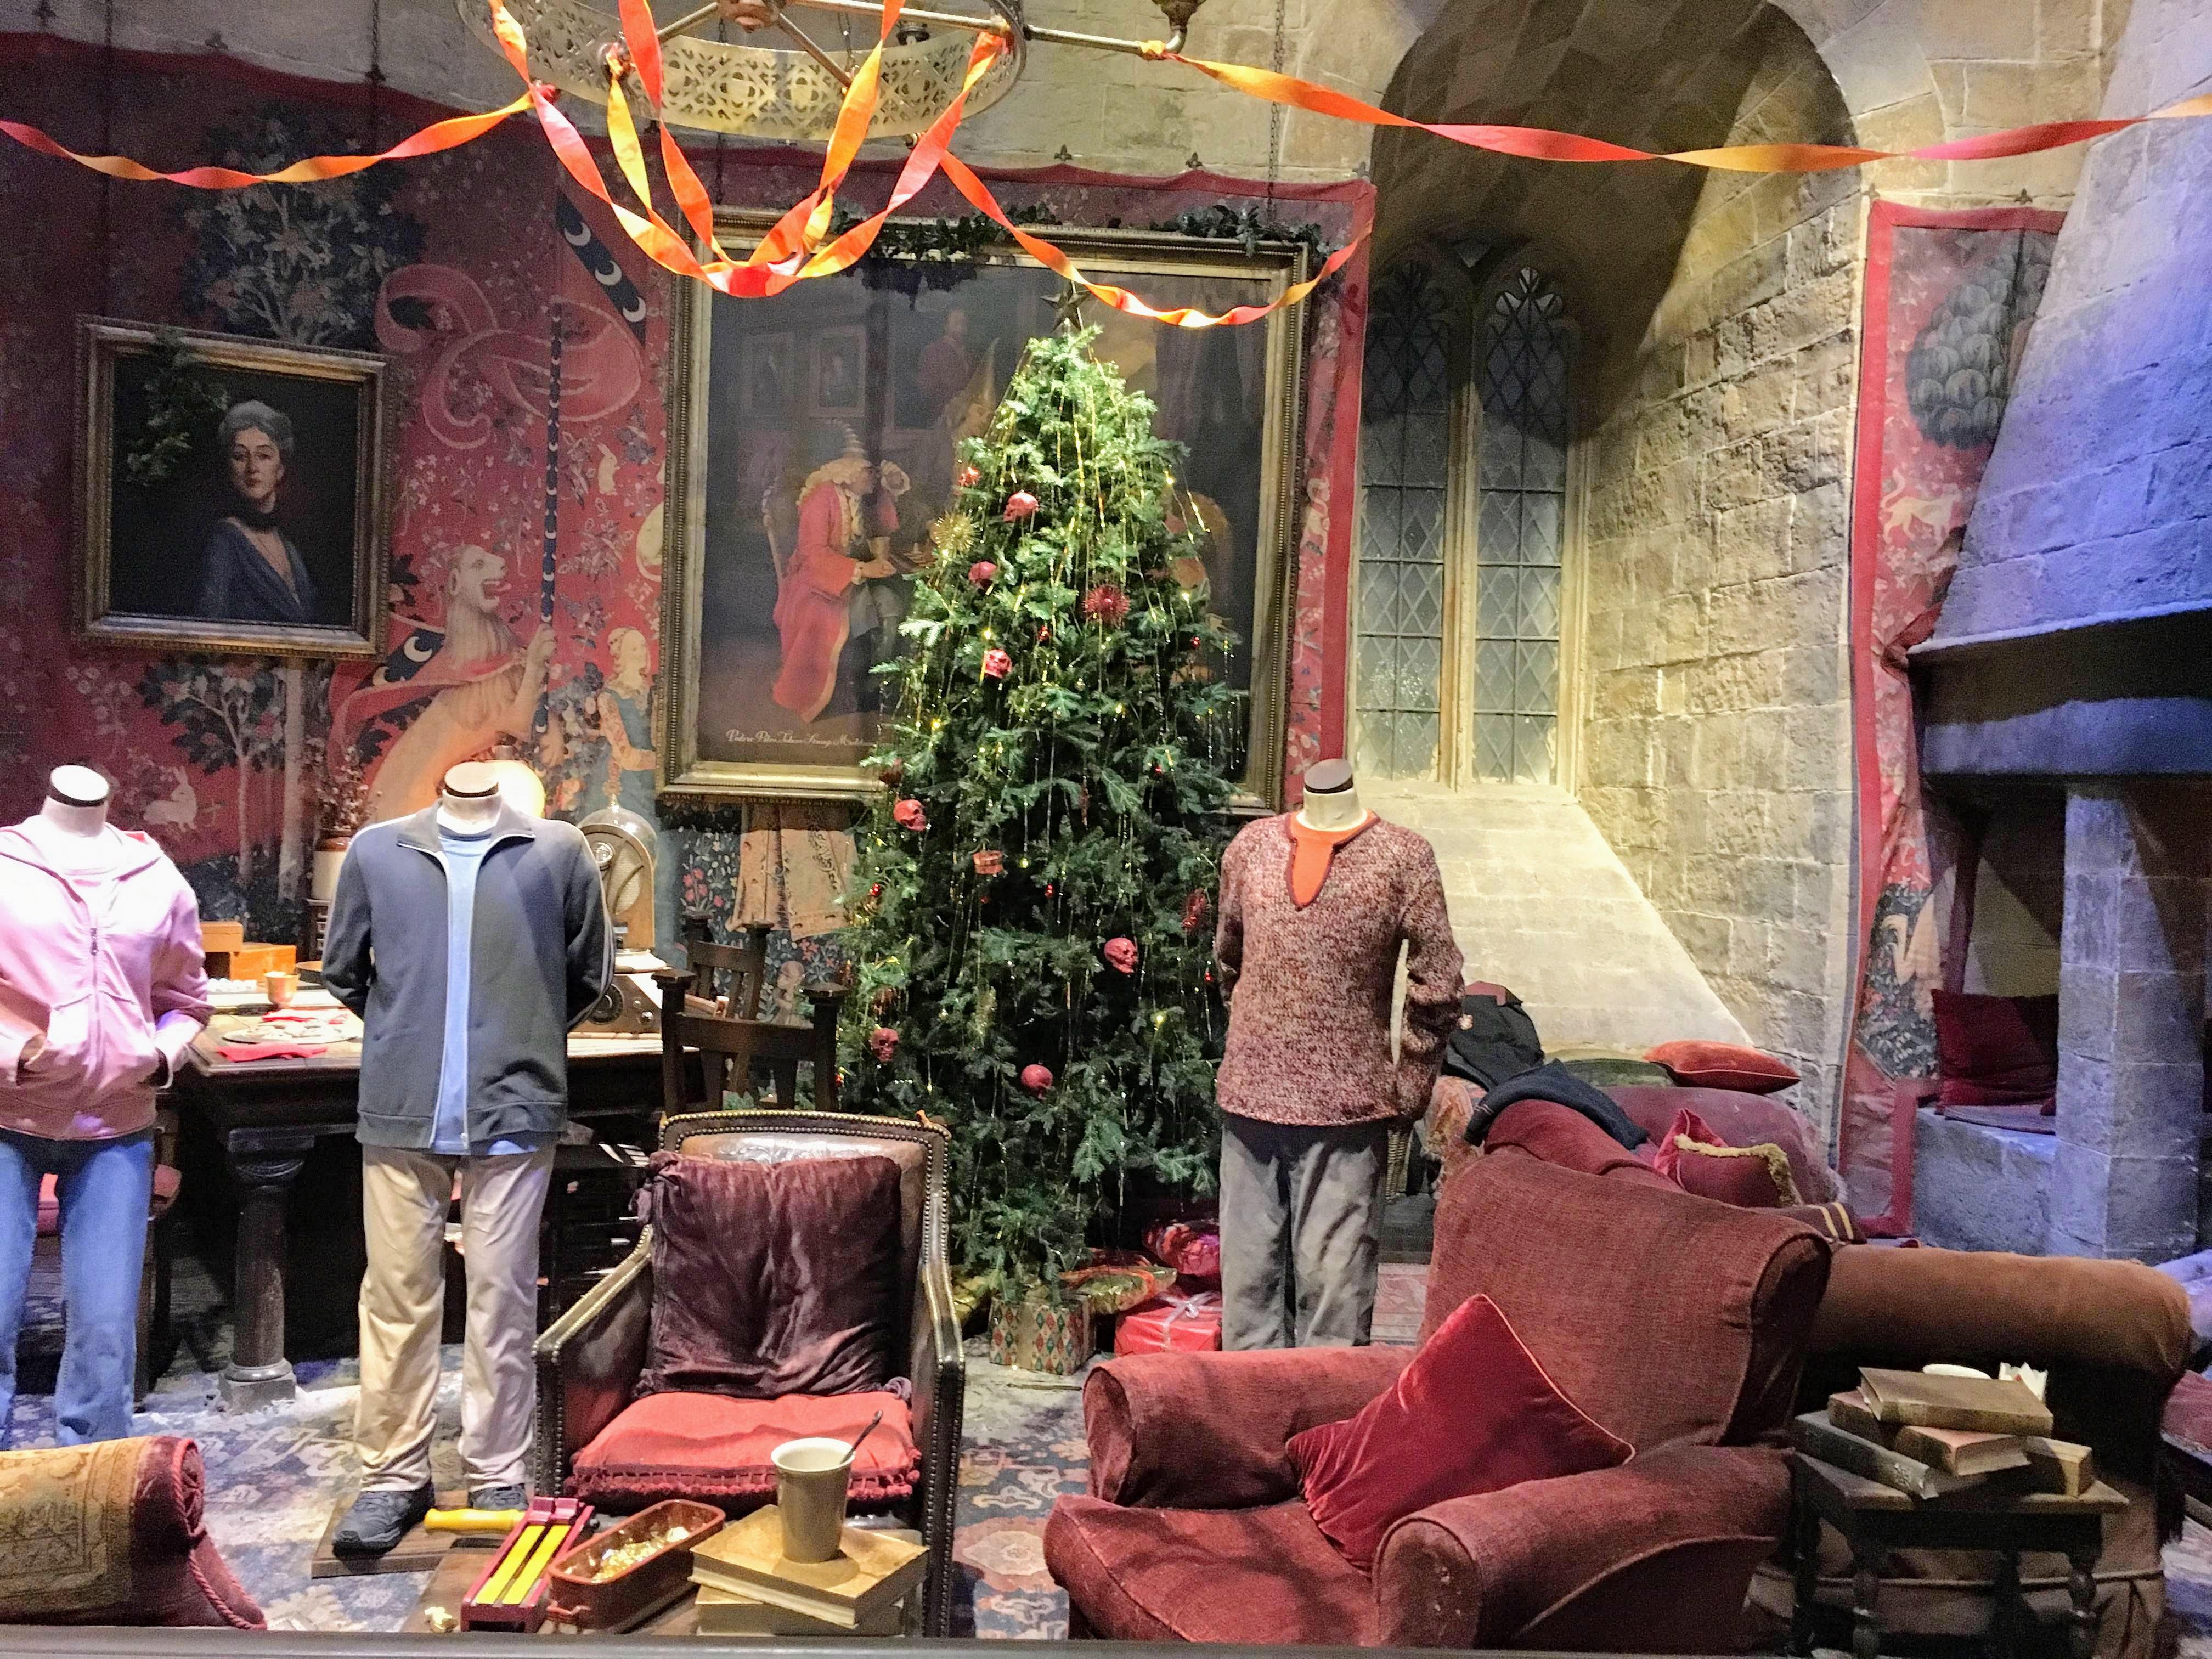 Harry Potter Studio Tour London Warner Bros Gryffindor Common Room movie set